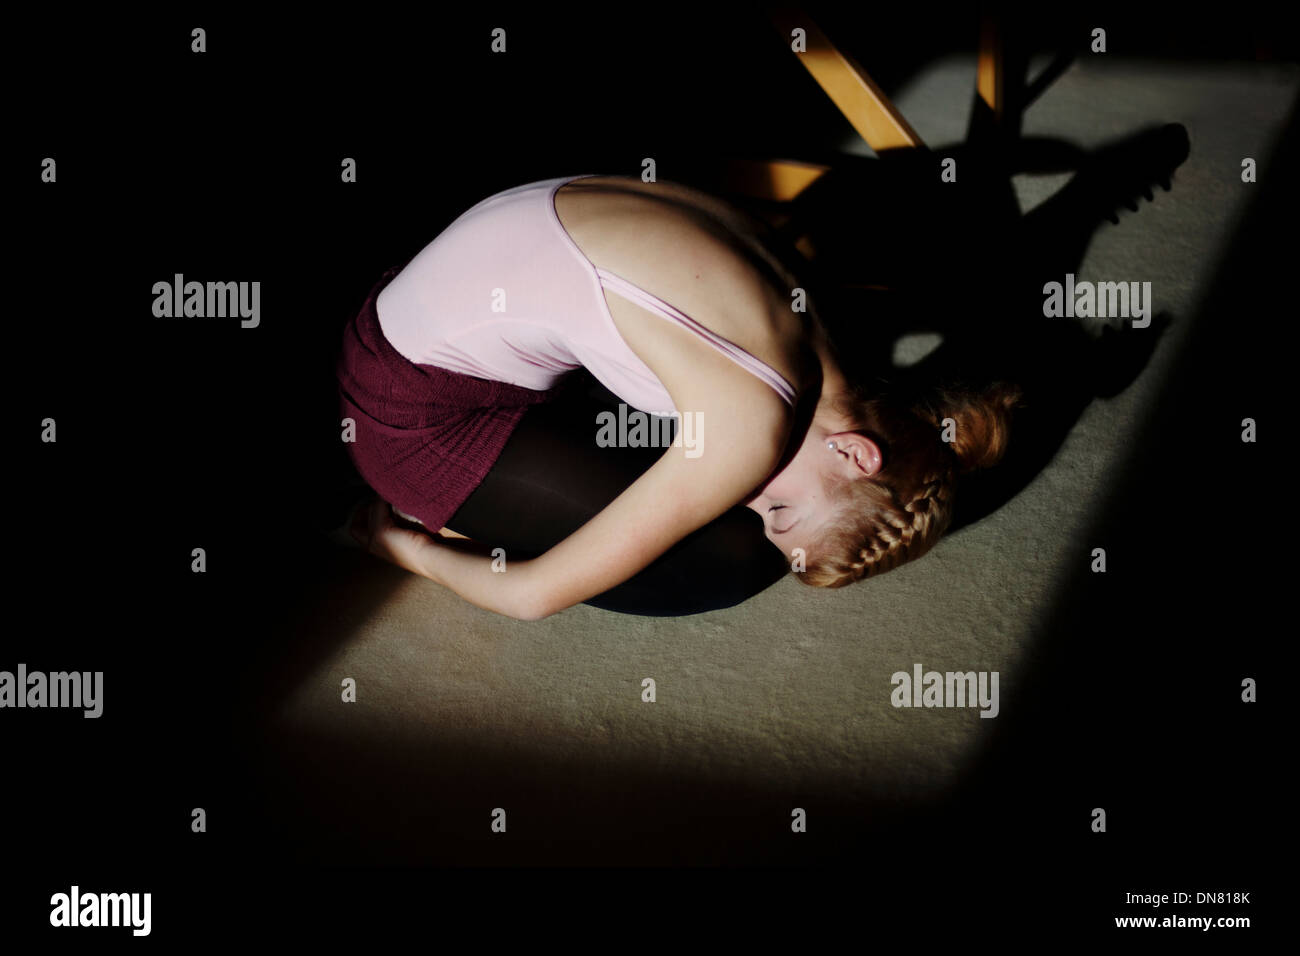 Young woman kneeling on the floor, portrait - Stock Image